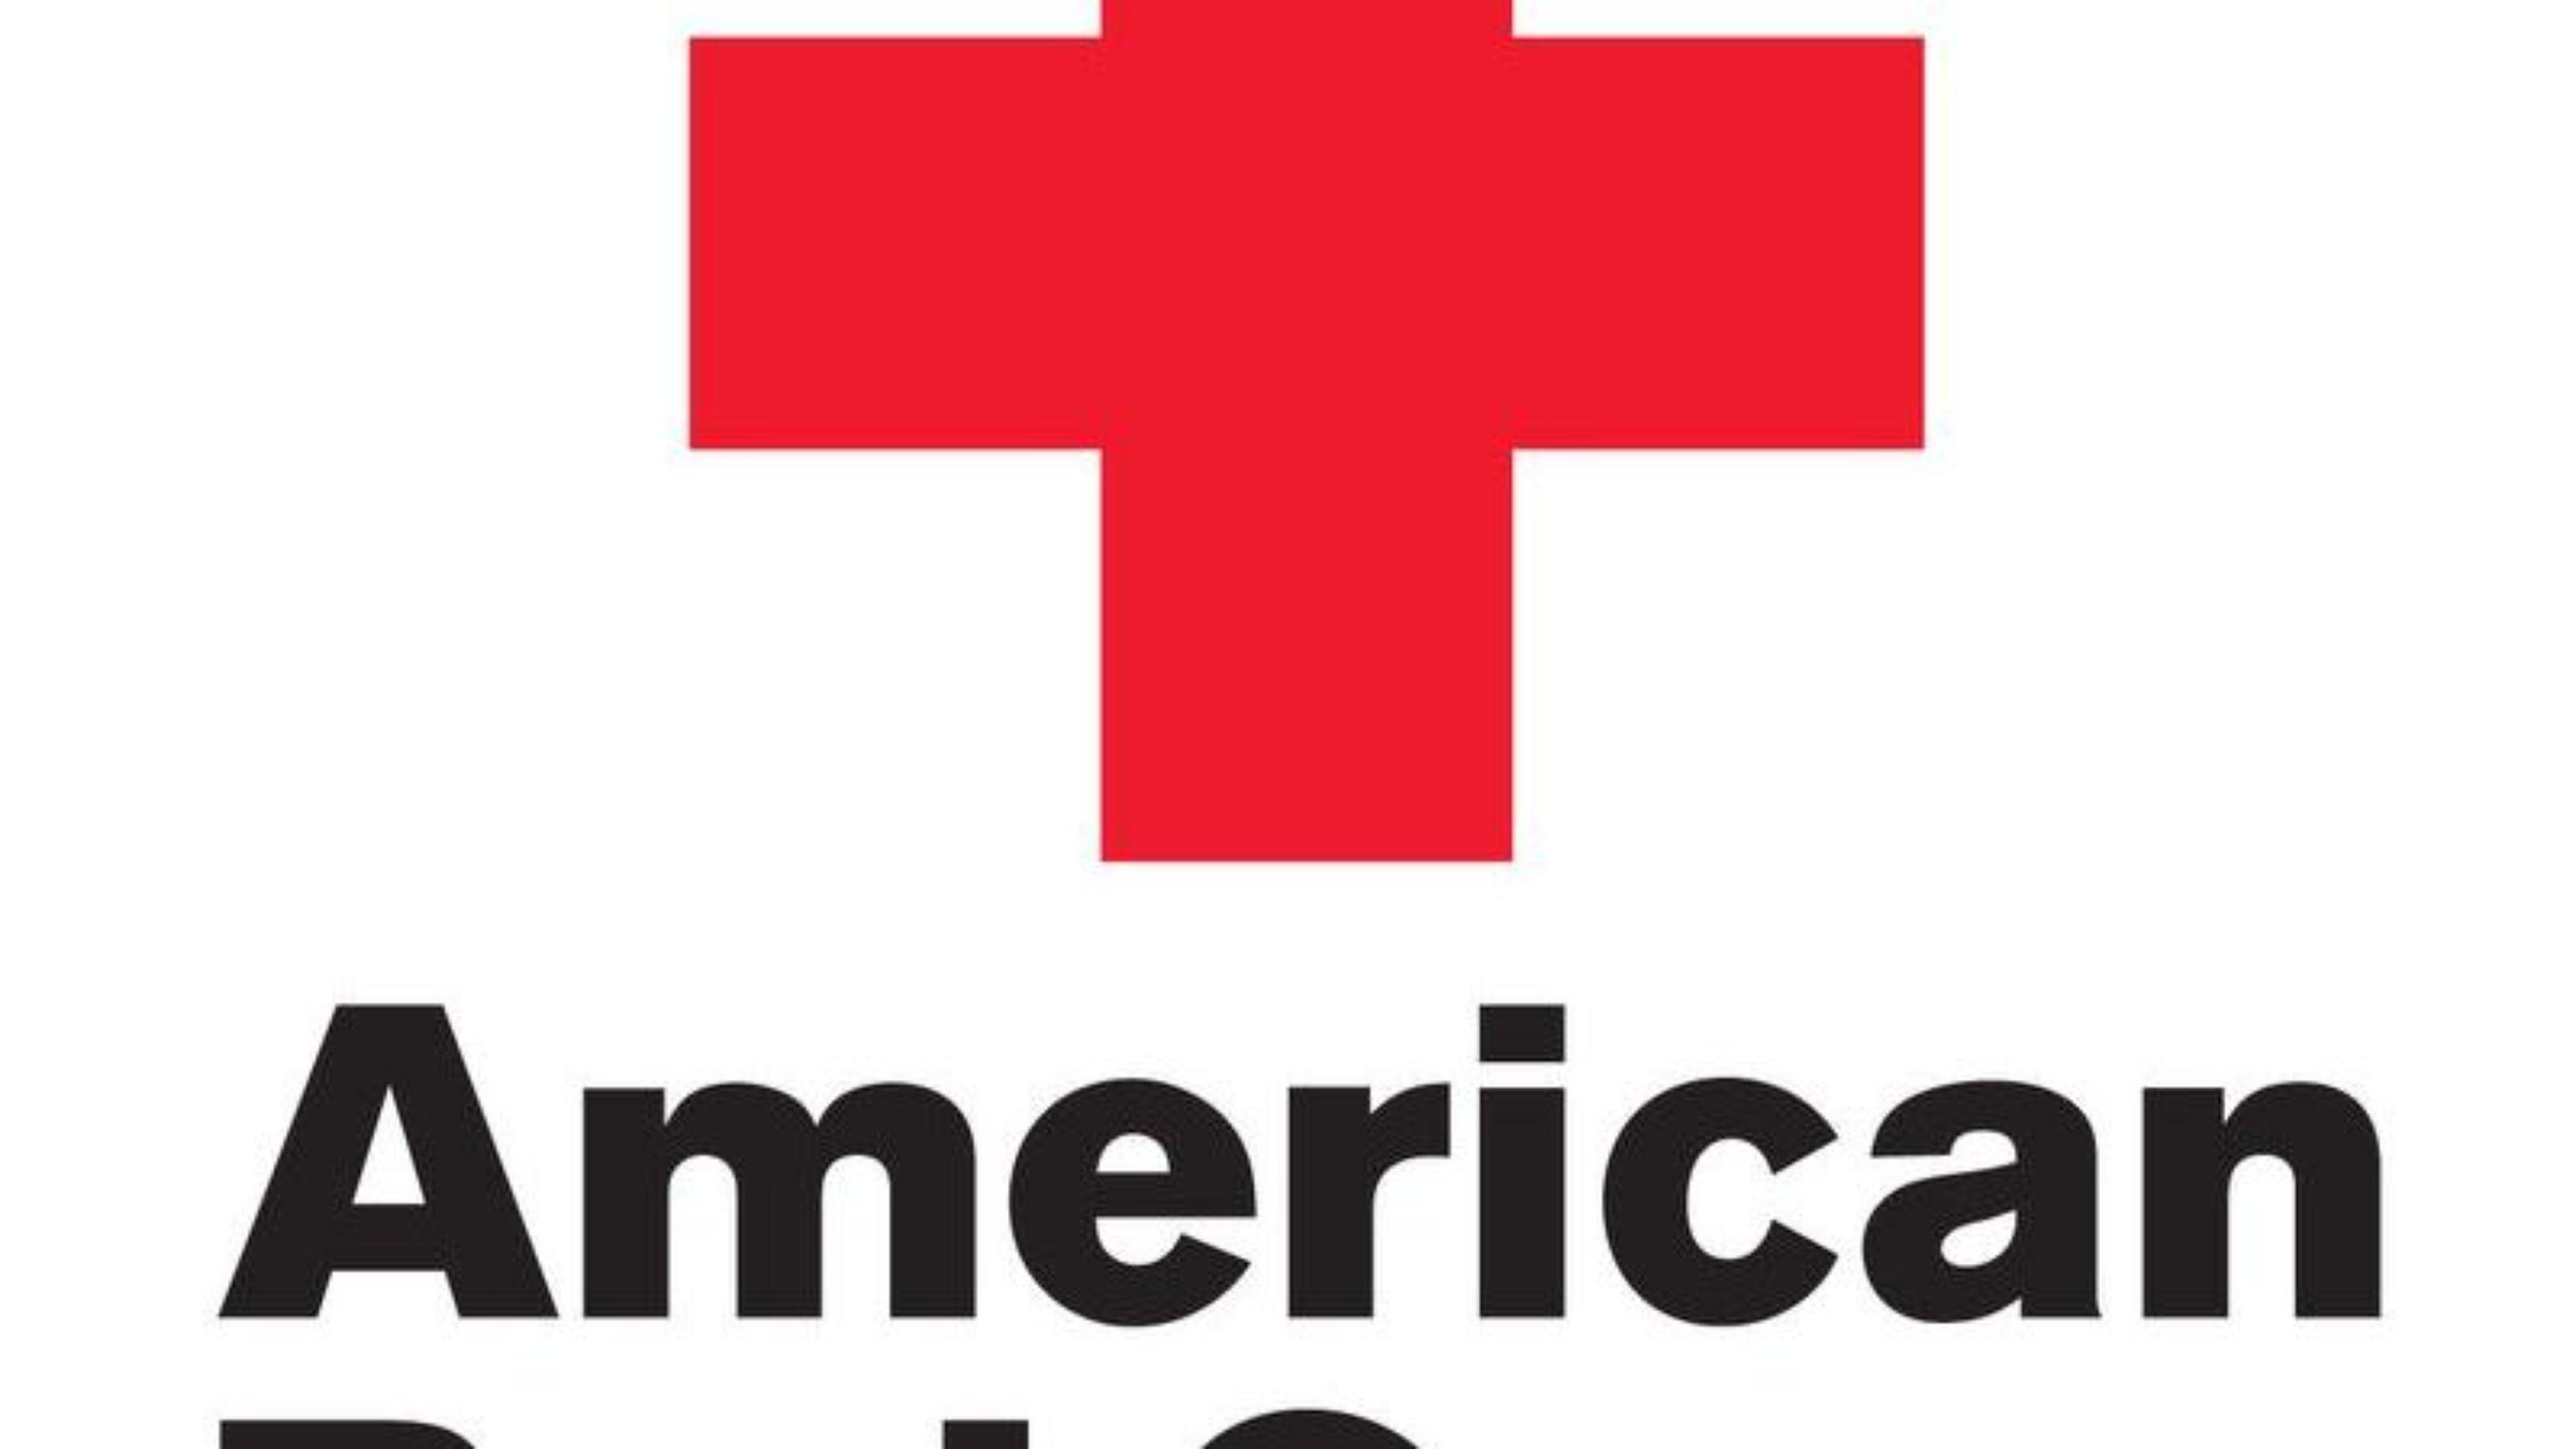 3200x1800 American Red Cross Logos